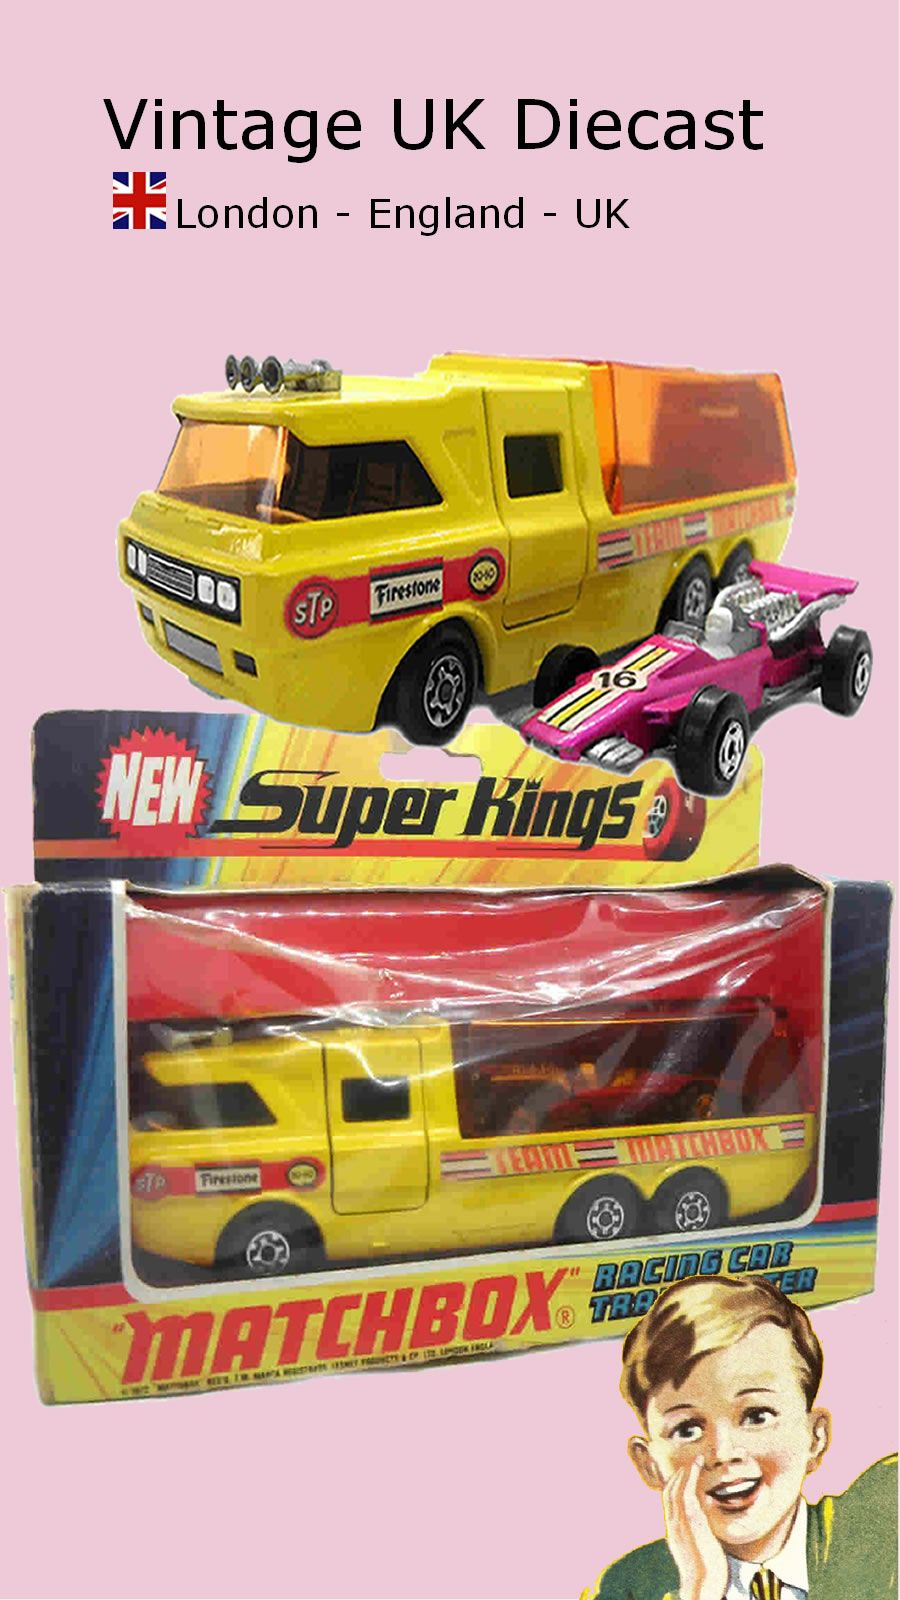 1970s Vintage Matchbox Superkings K 7 Racing Car Transporter In 2020 Matchbox Matchbox Cars Diecast